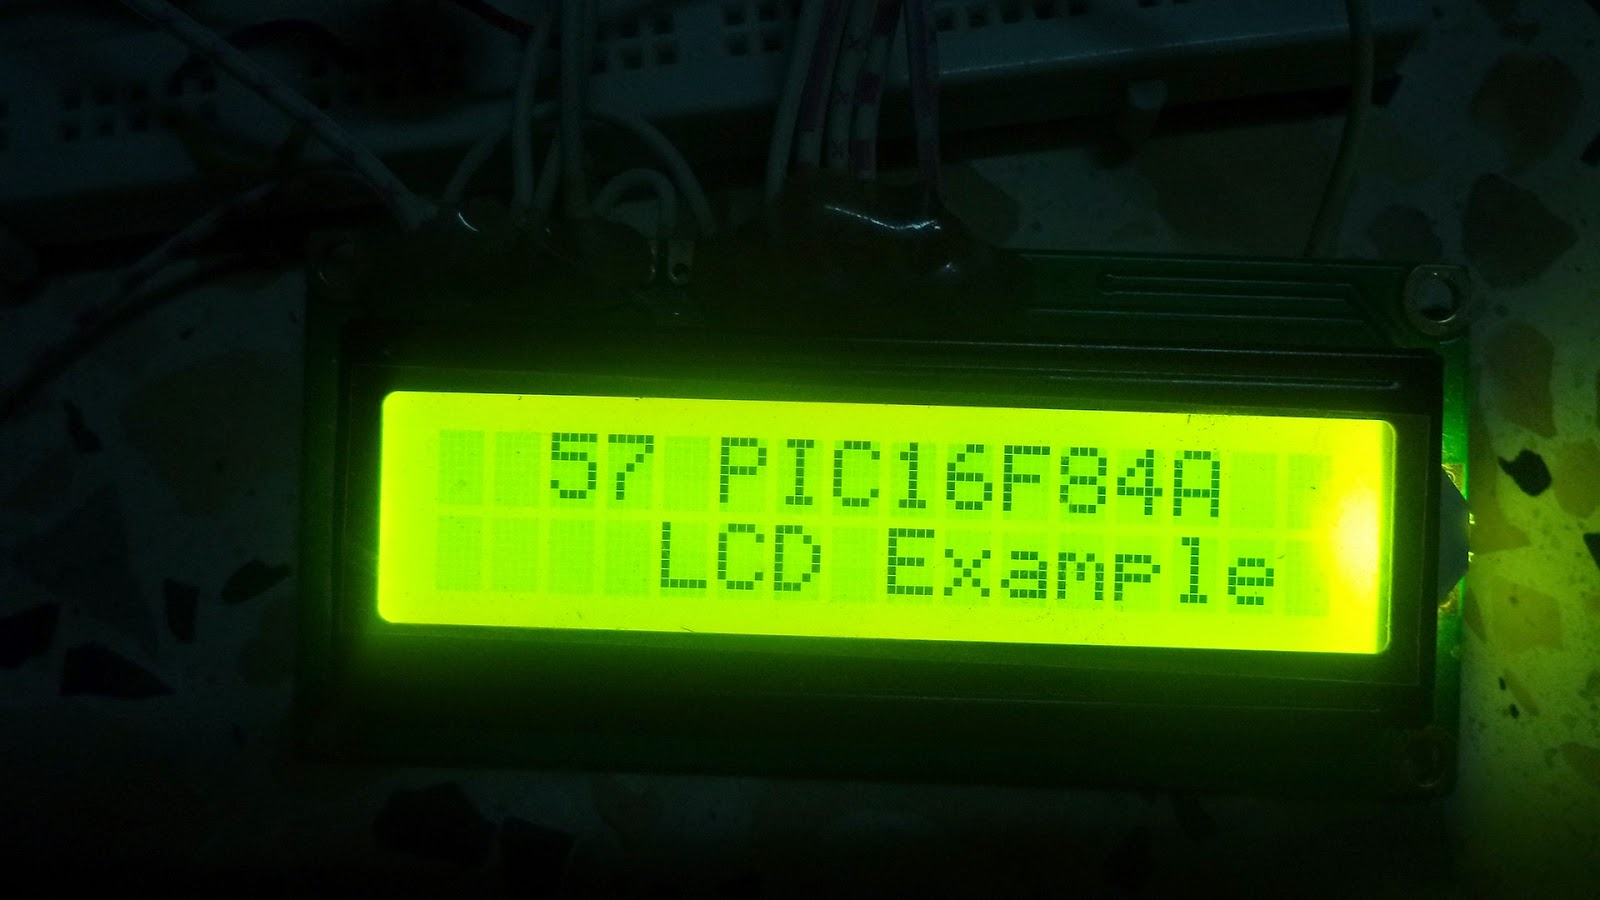 PIC16F84A lcd mikroc